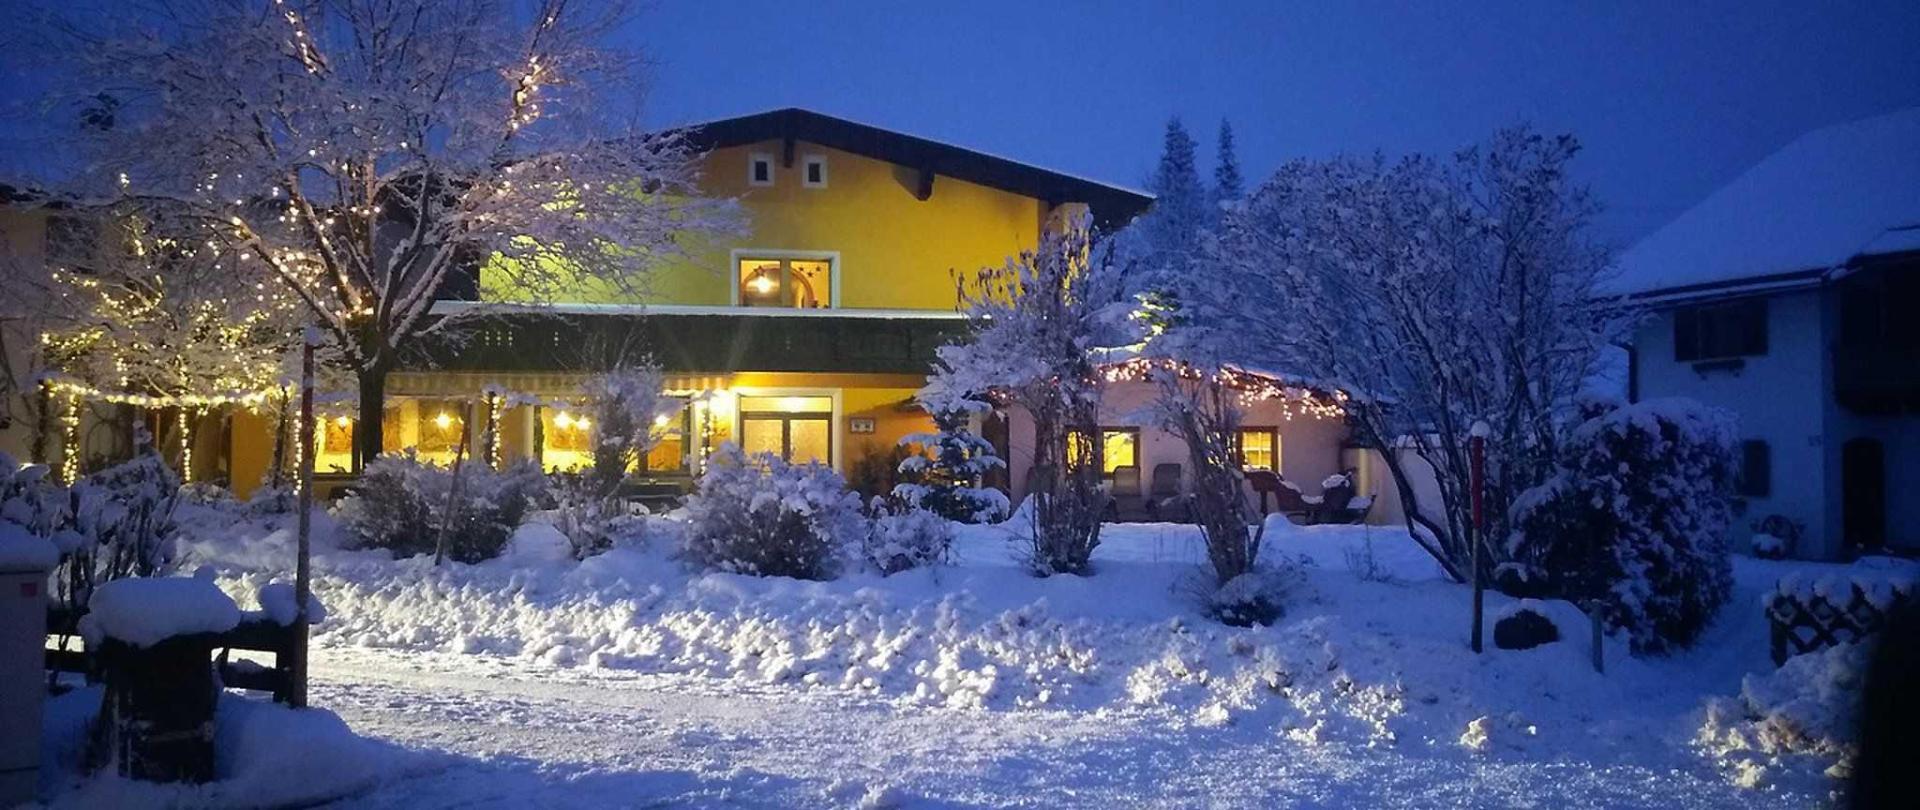 winter-3600px.jpg